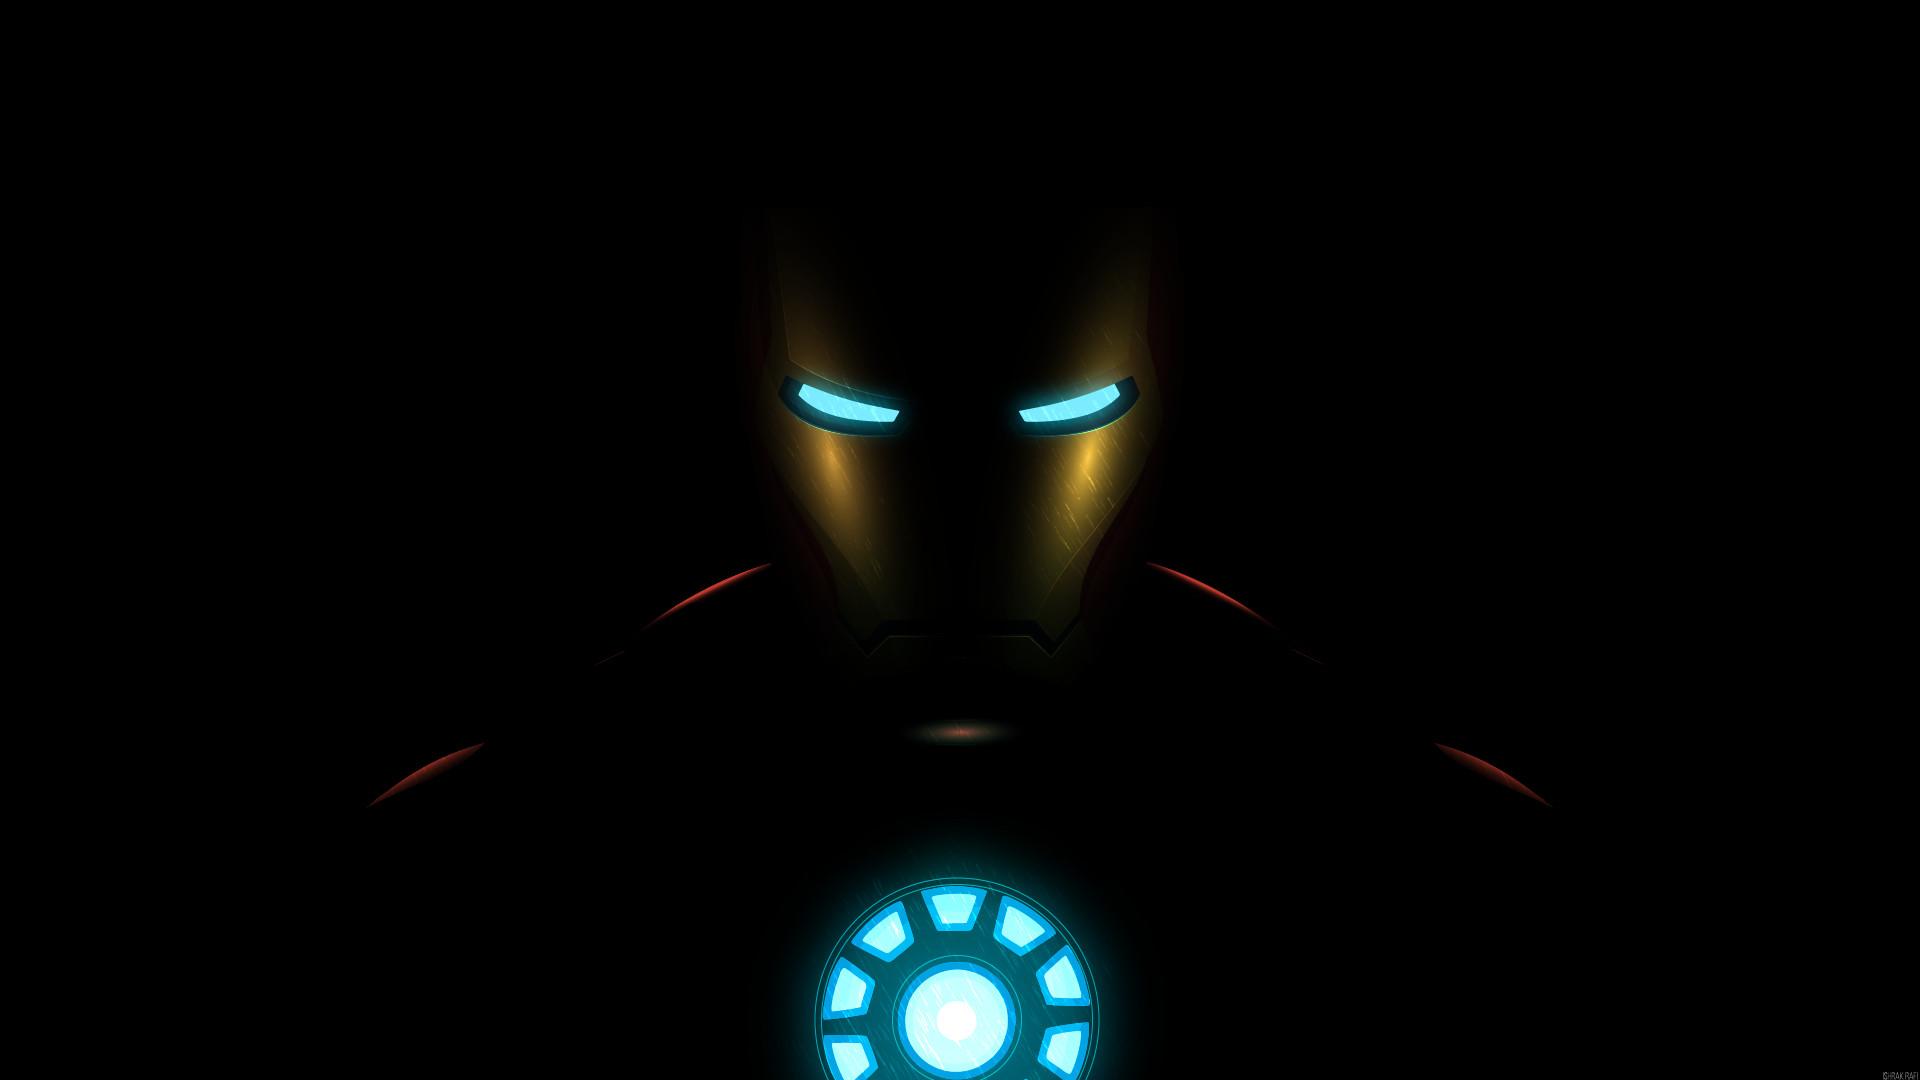 Iron man hd 2018 hd superheroes 4k wallpapers images - Iron man cartoon hd ...